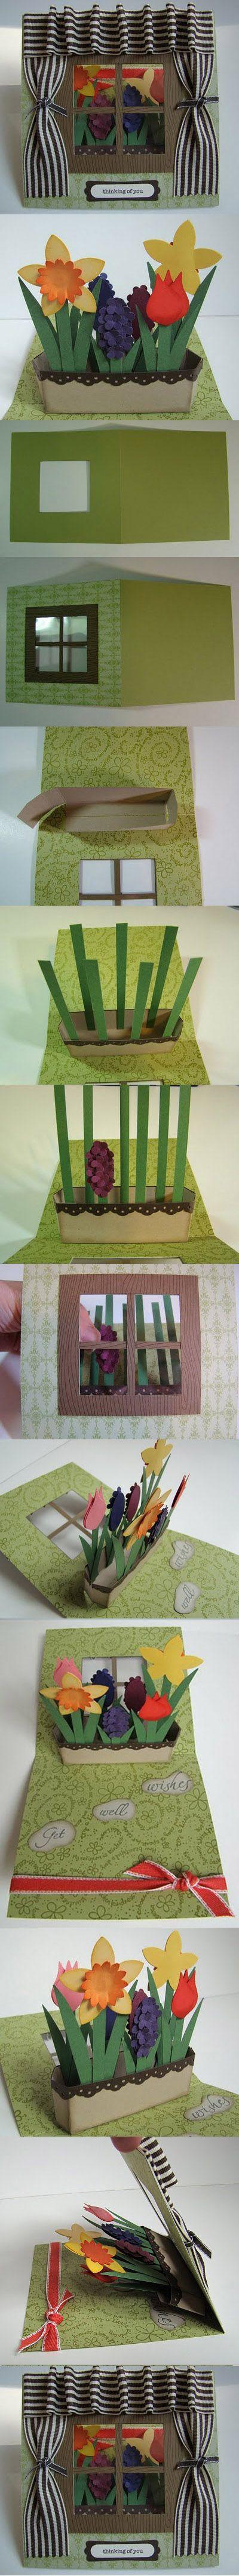 Tarjeta de ventana con flores